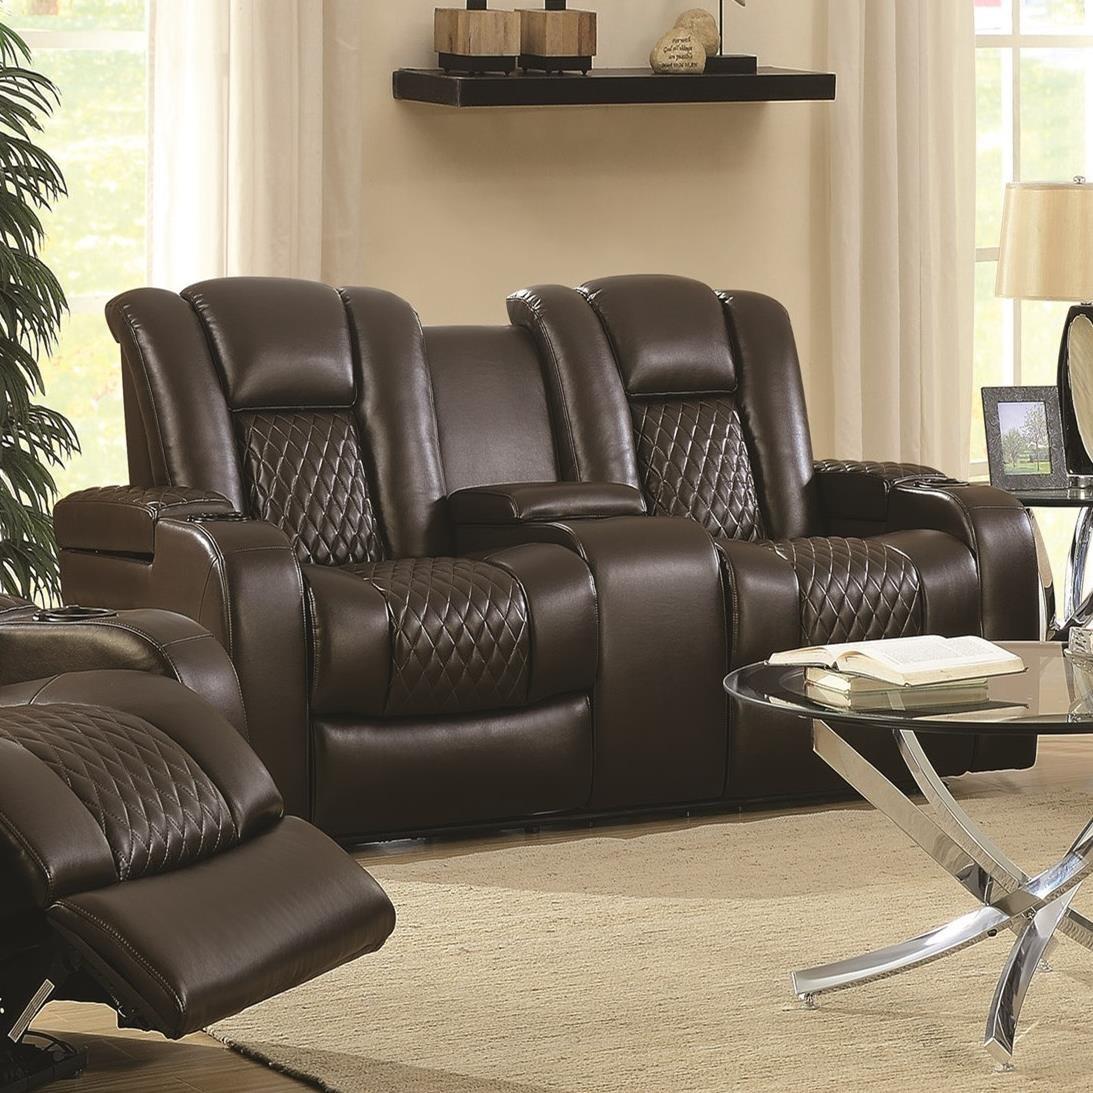 power reclining sofa with cup holders fundas para sofas en l coaster delangelo 602305p casual love seat